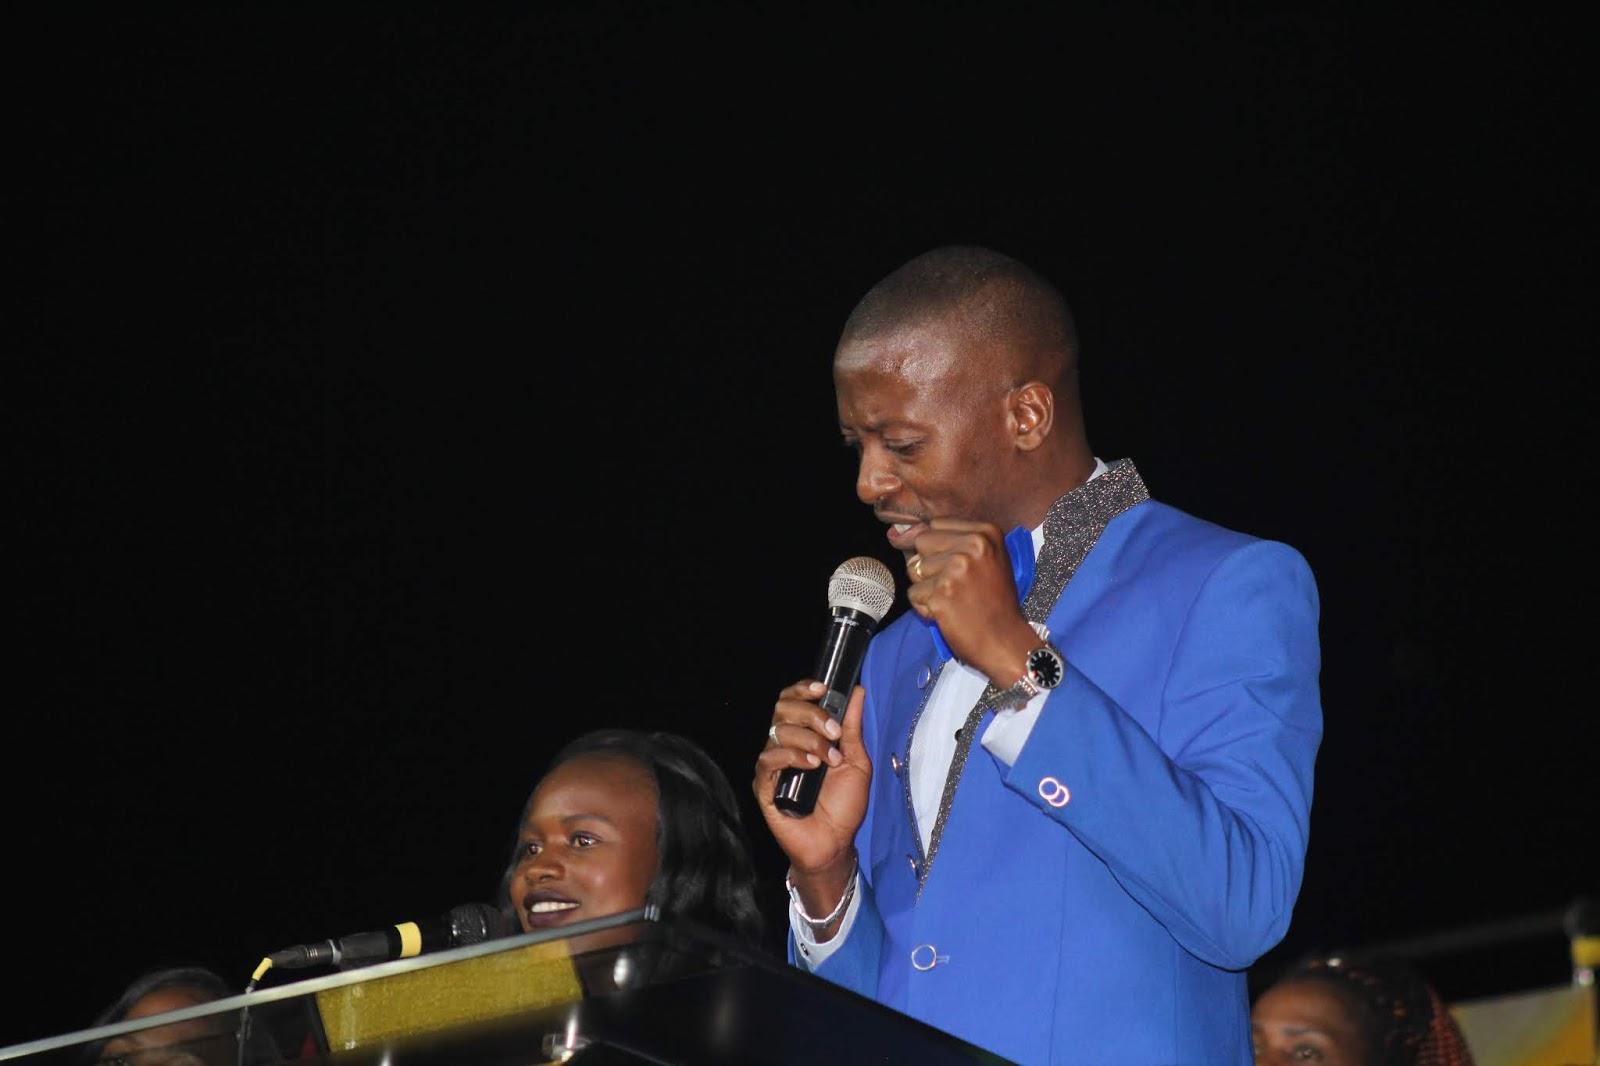 Apostle Pride Sibiya Introduces Apostle Shiloh Masenyama